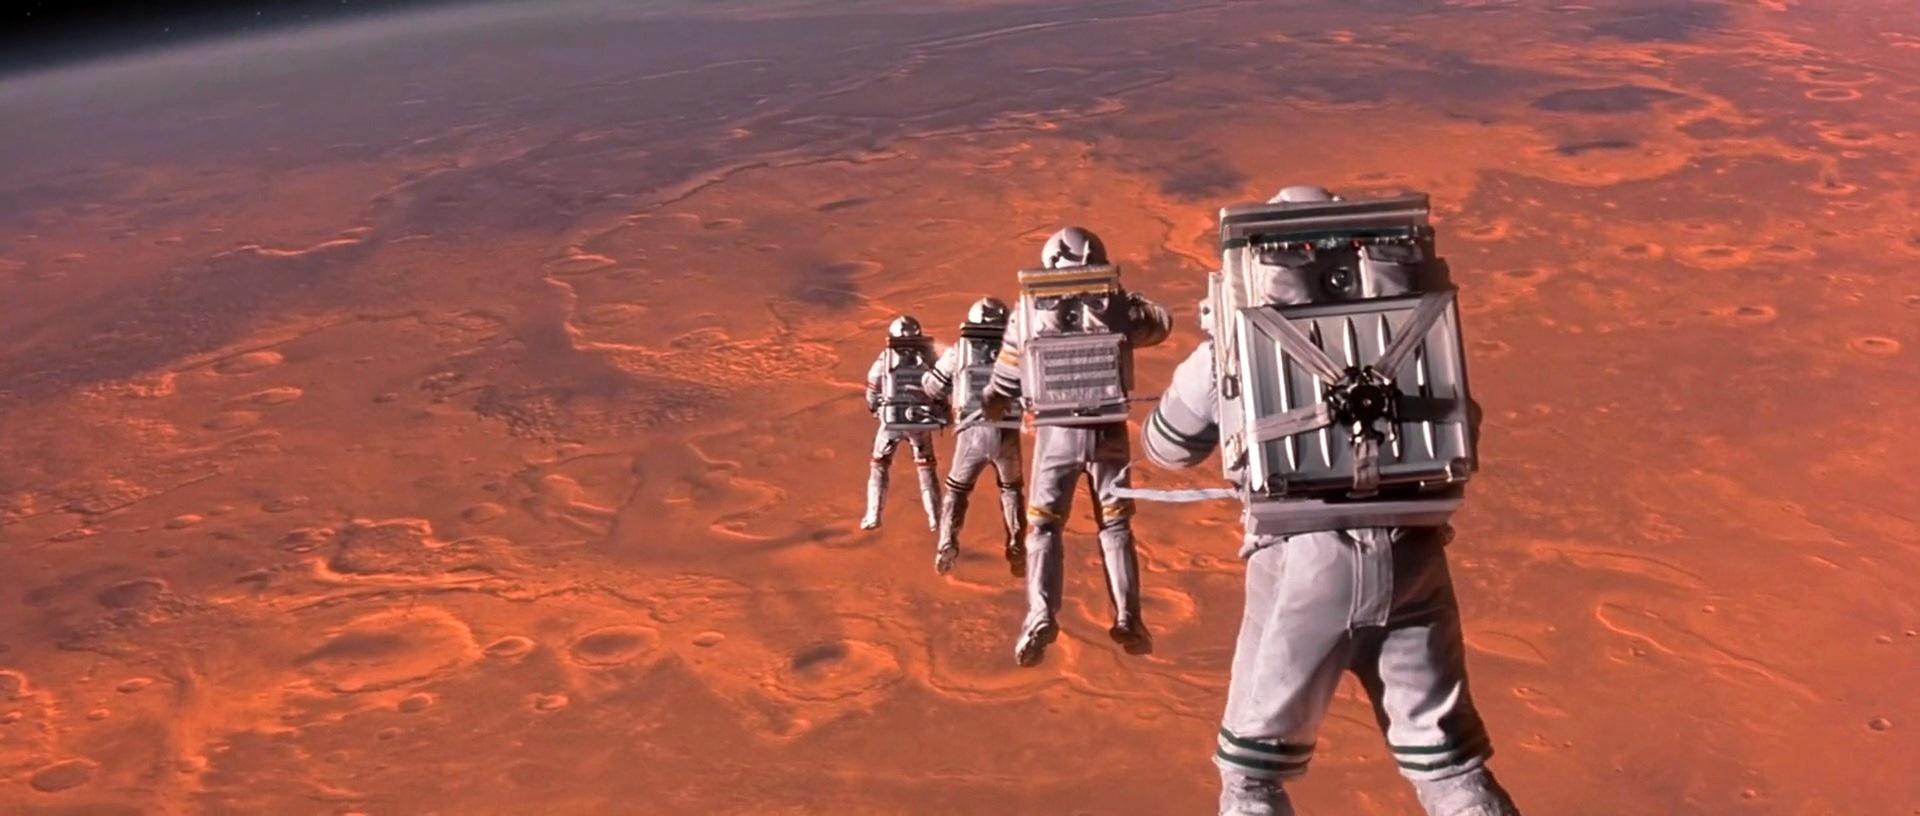 картошка на марсе фото кто уже побывал